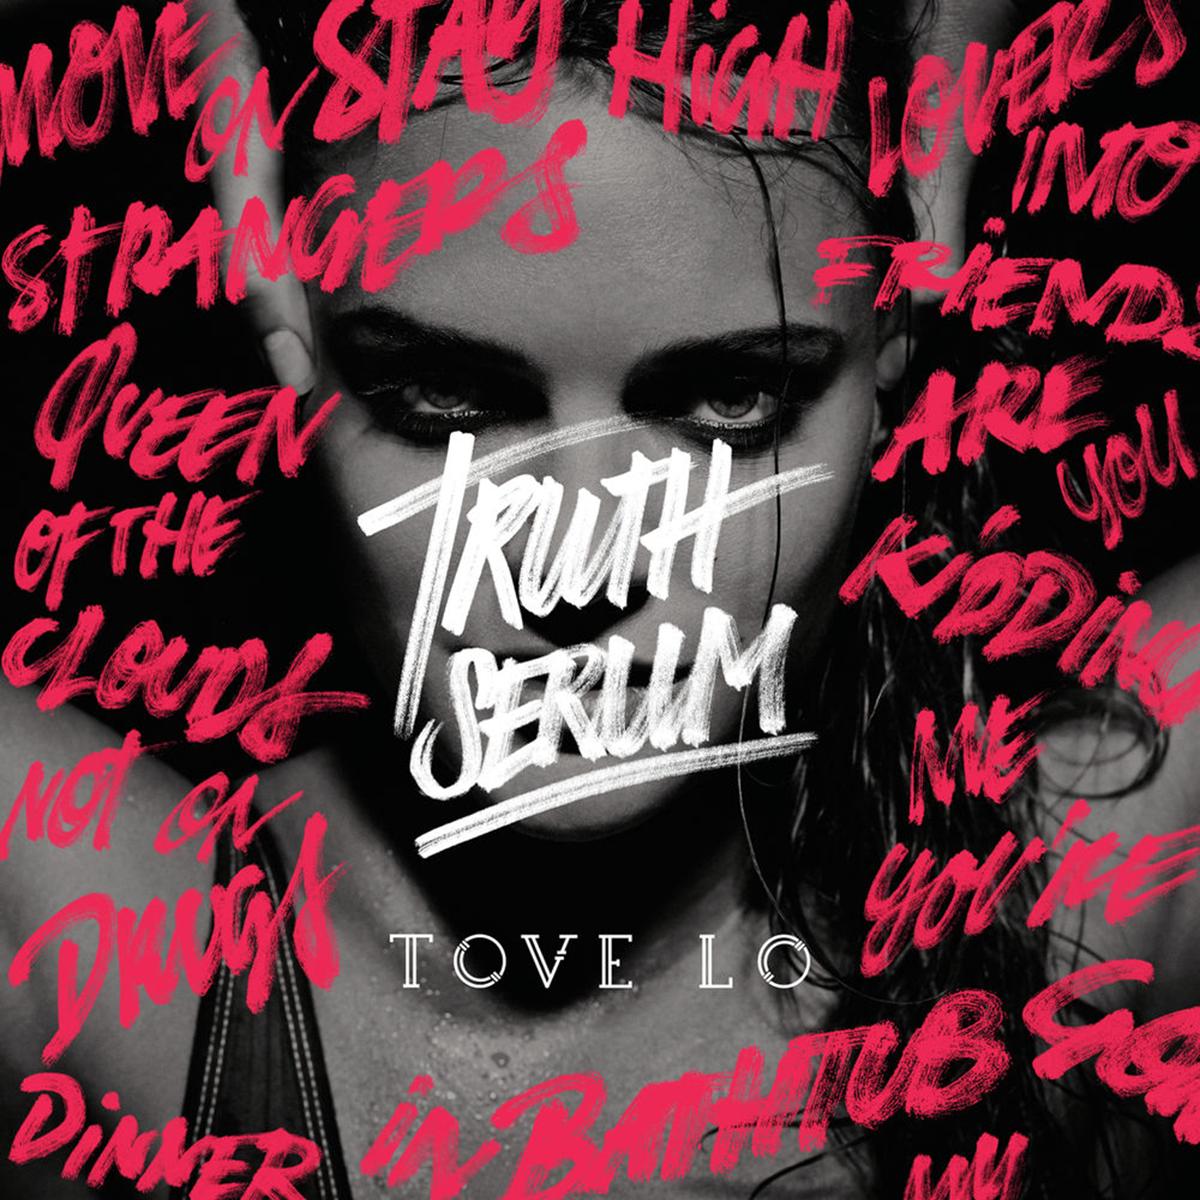 Tove-Lo-Truth-Serum-2014-1200x1200